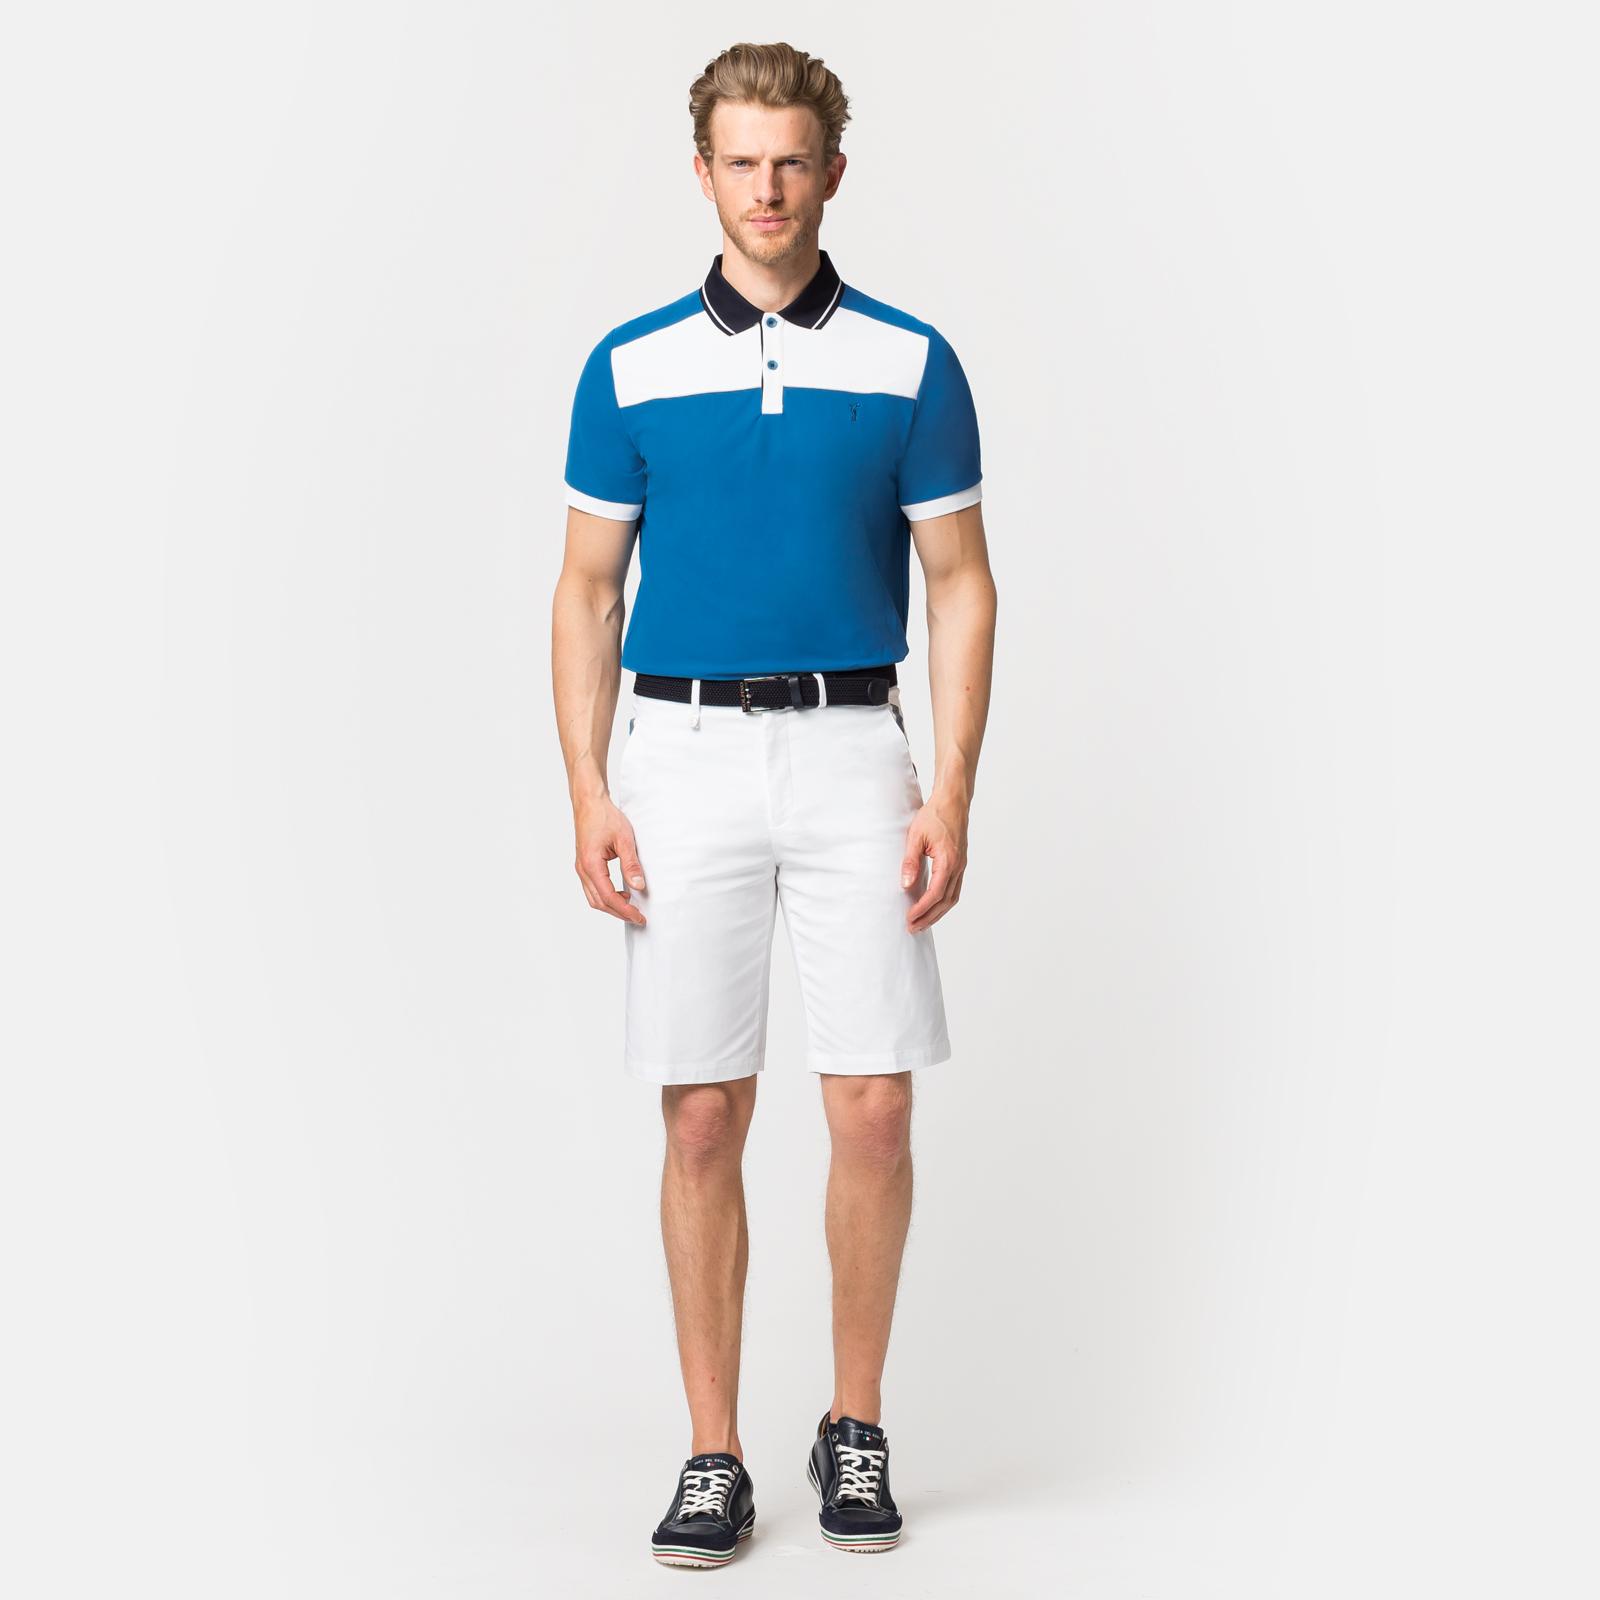 Herren Funktions-Golfpolo feuchtigkeitsregulierend in Regular Fit